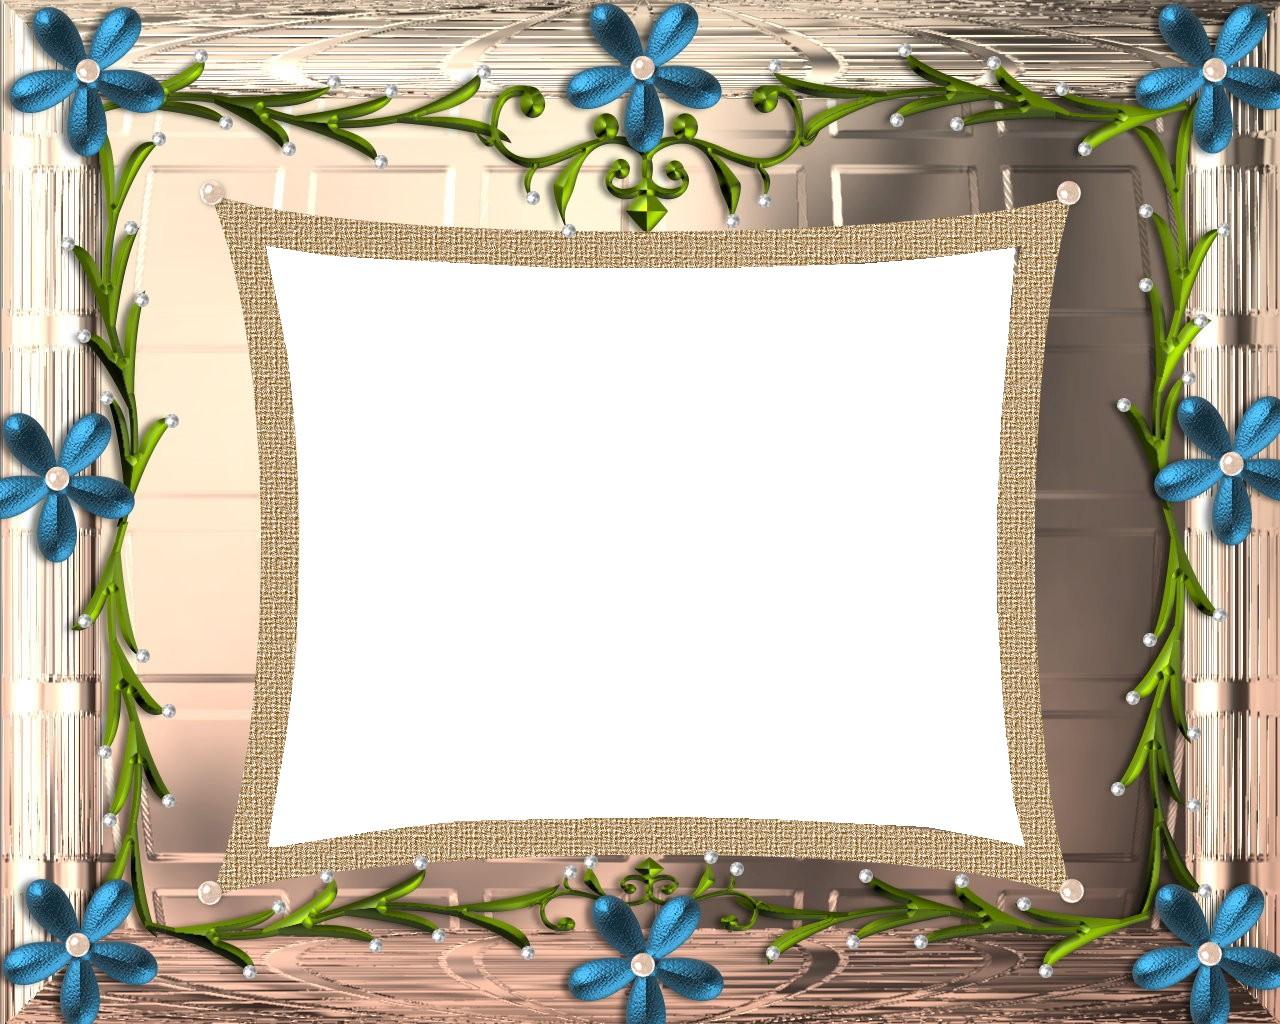 hello_html_md9fc610.jpg